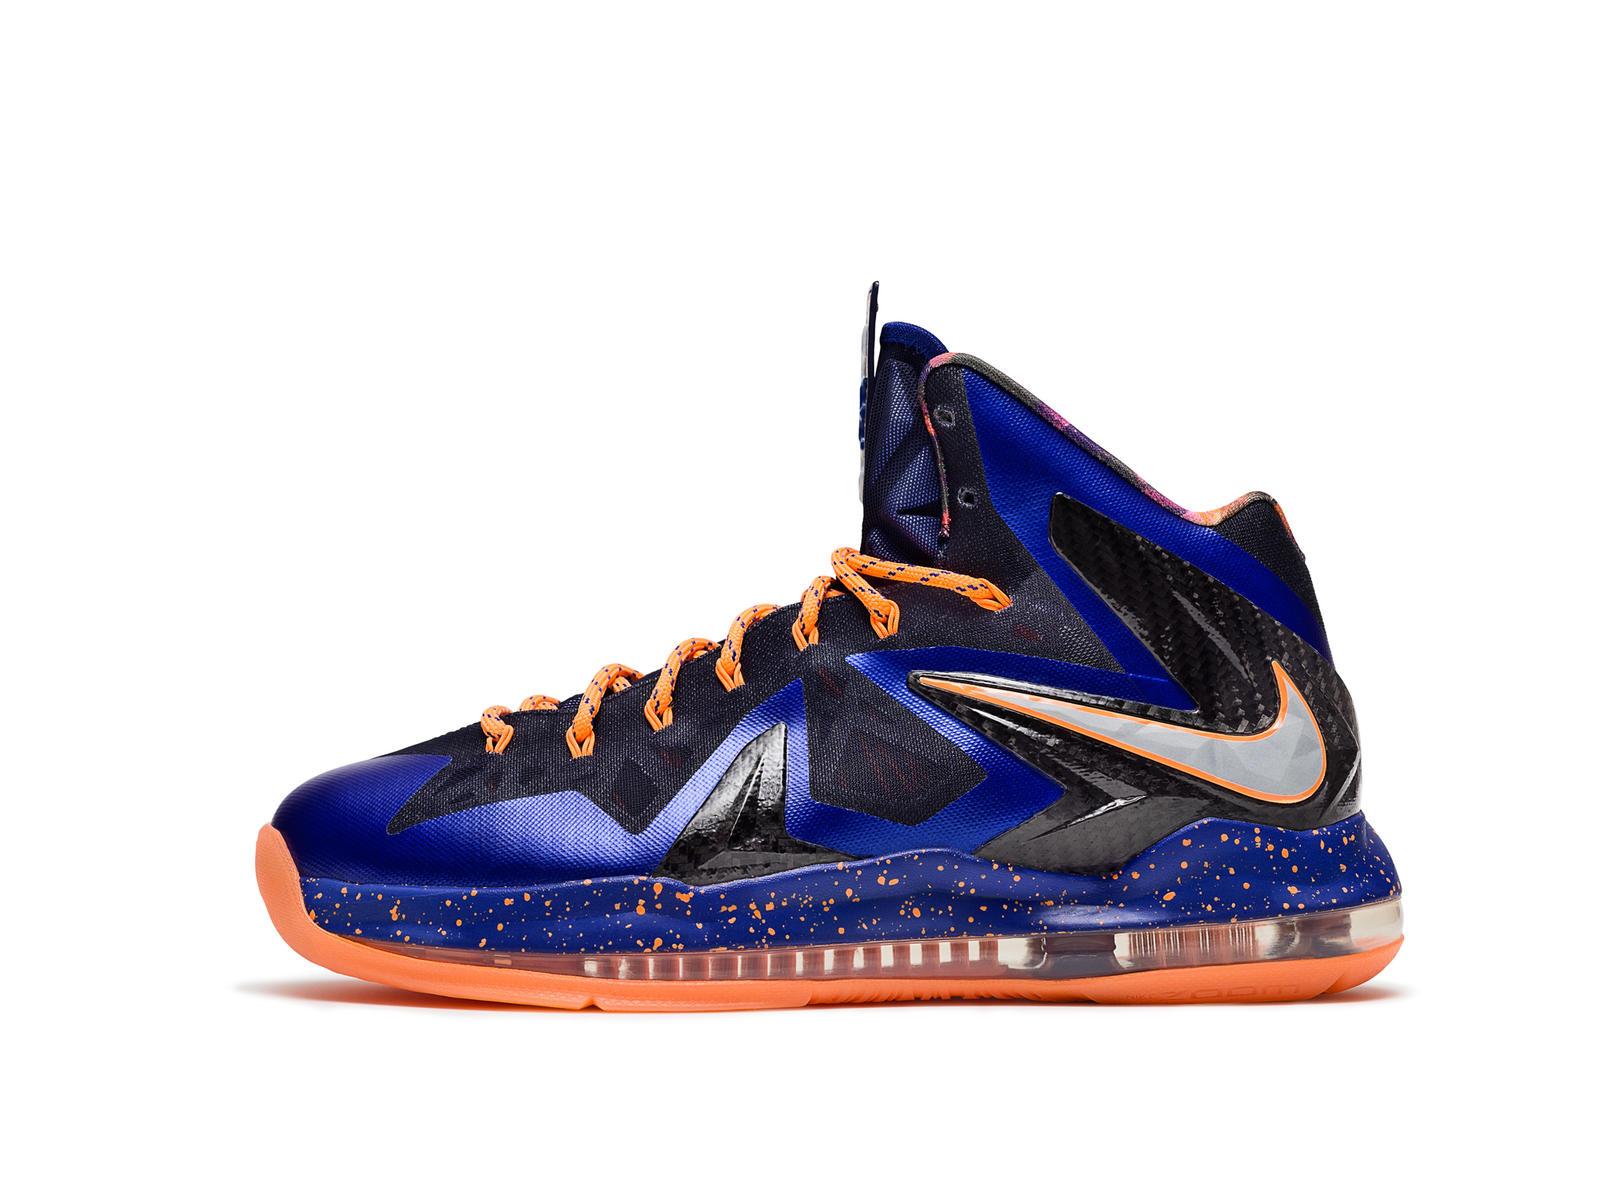 Nike News - Nike Basketball's ELITE Series 2.0 Rises Above the Rest